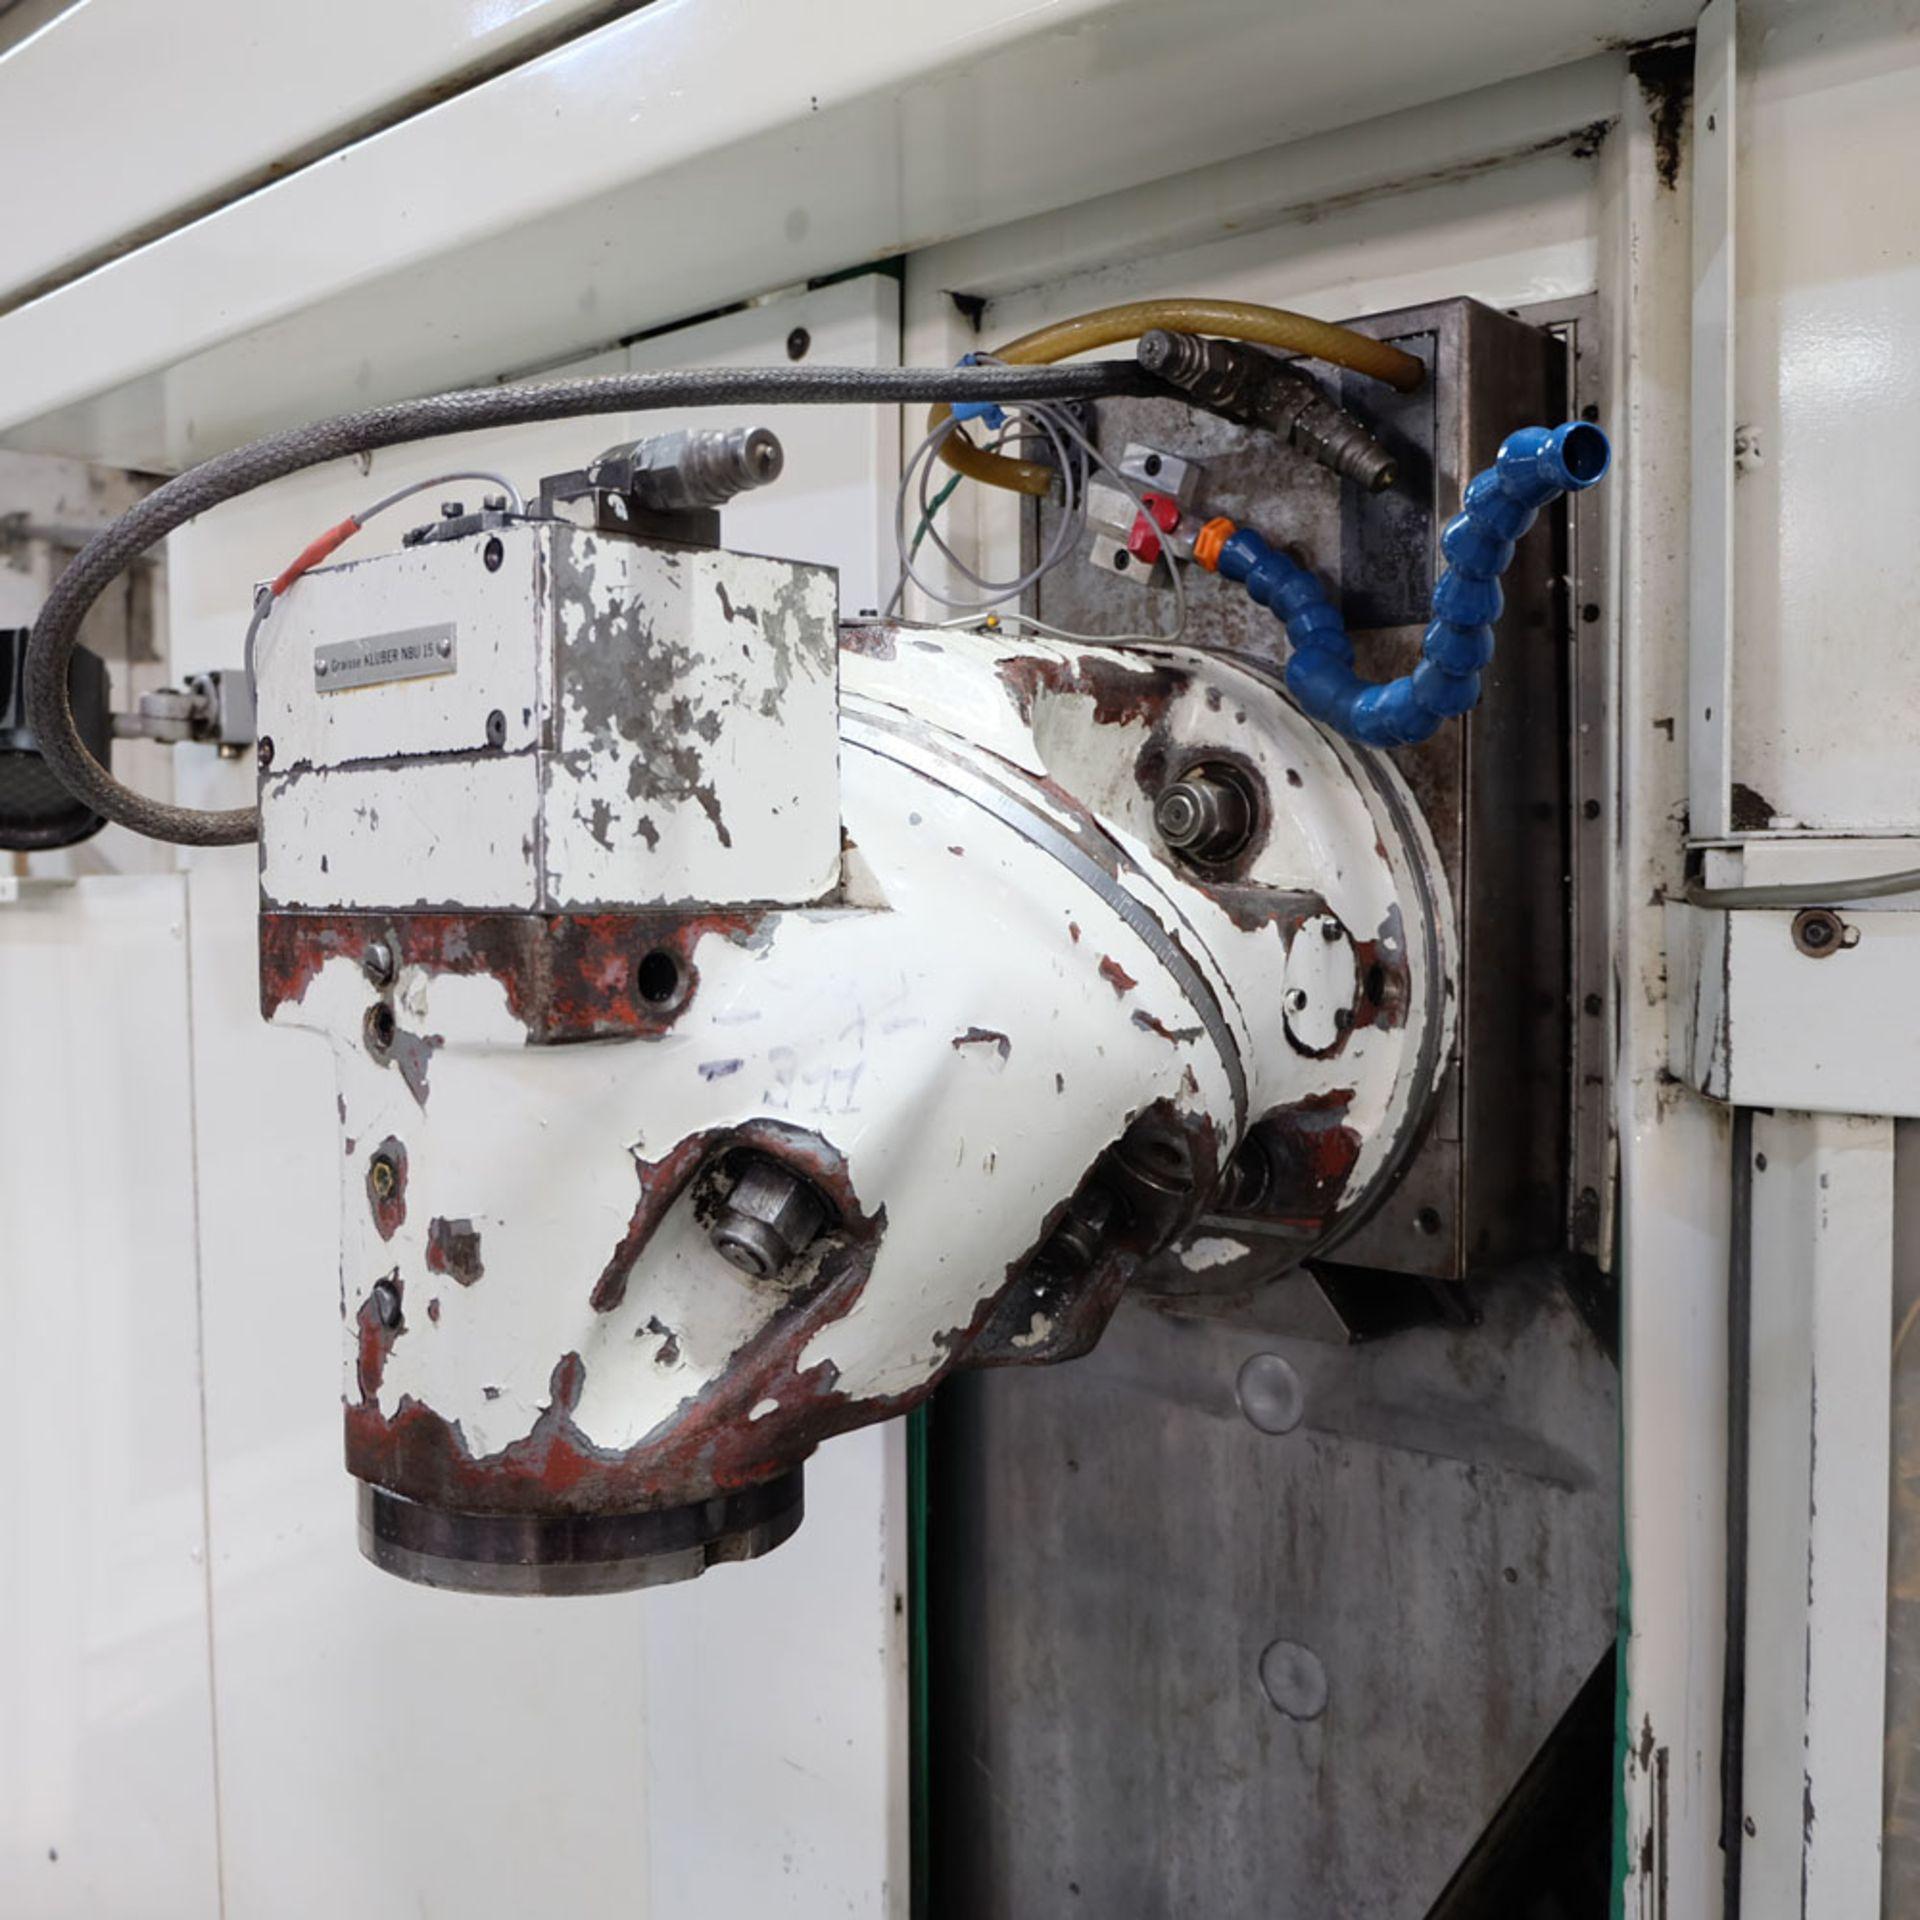 Huron GX 411 F Bed Type Milling Machine. Control Unit: CNC (HEIDENHAIN TNC 415B) - Image 5 of 12